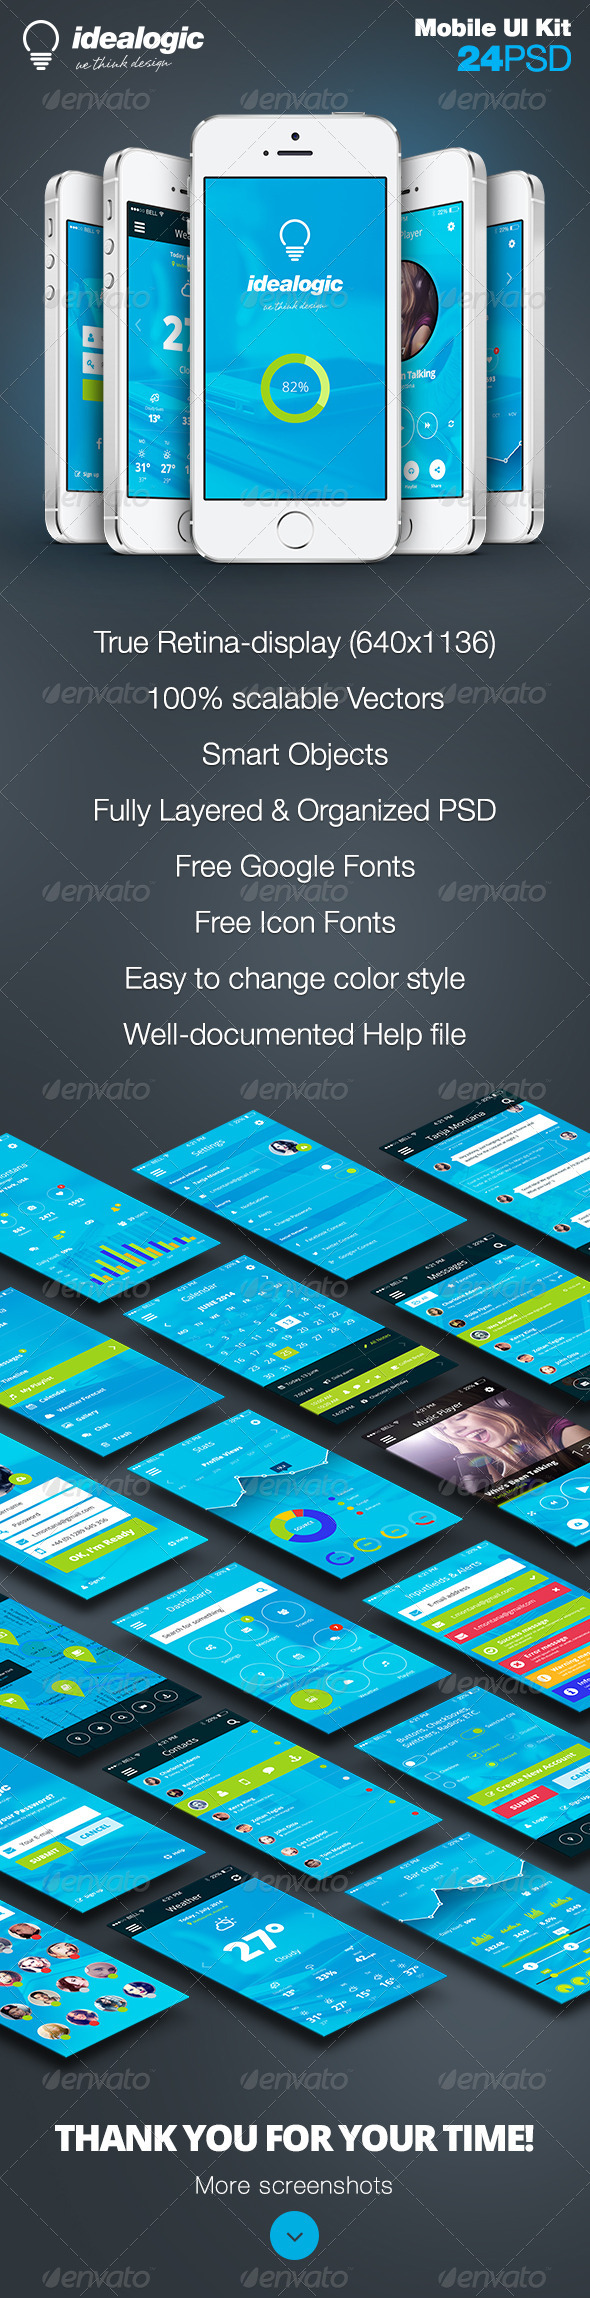 GraphicRiver Idealogic Flat Mobile App UI Design 8294953